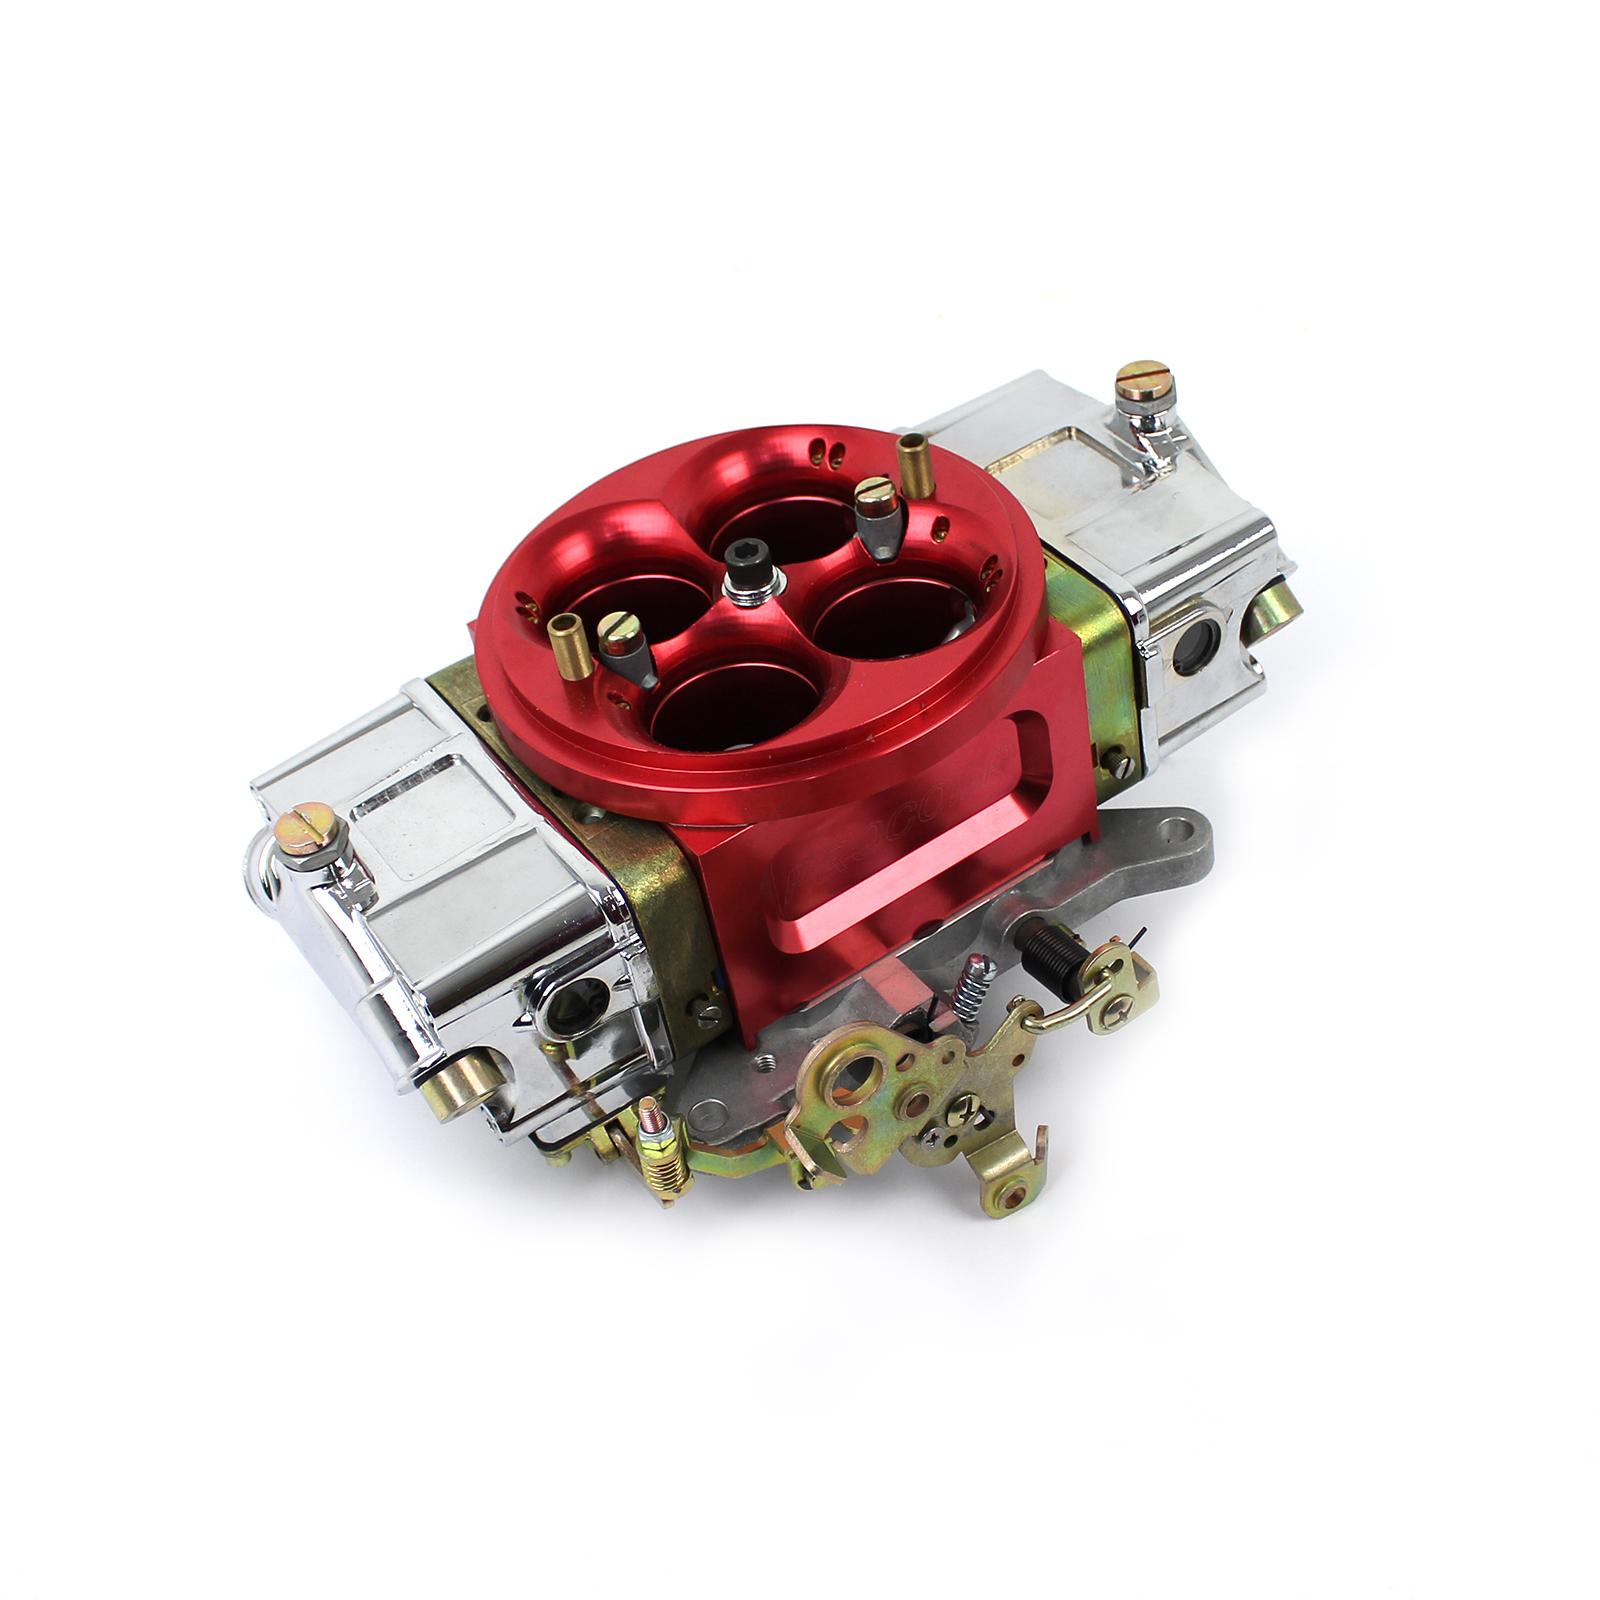 950 CFM Billet 4-Bbl Mechanical Sec Double Pumper Race Bred Carburetor 2C